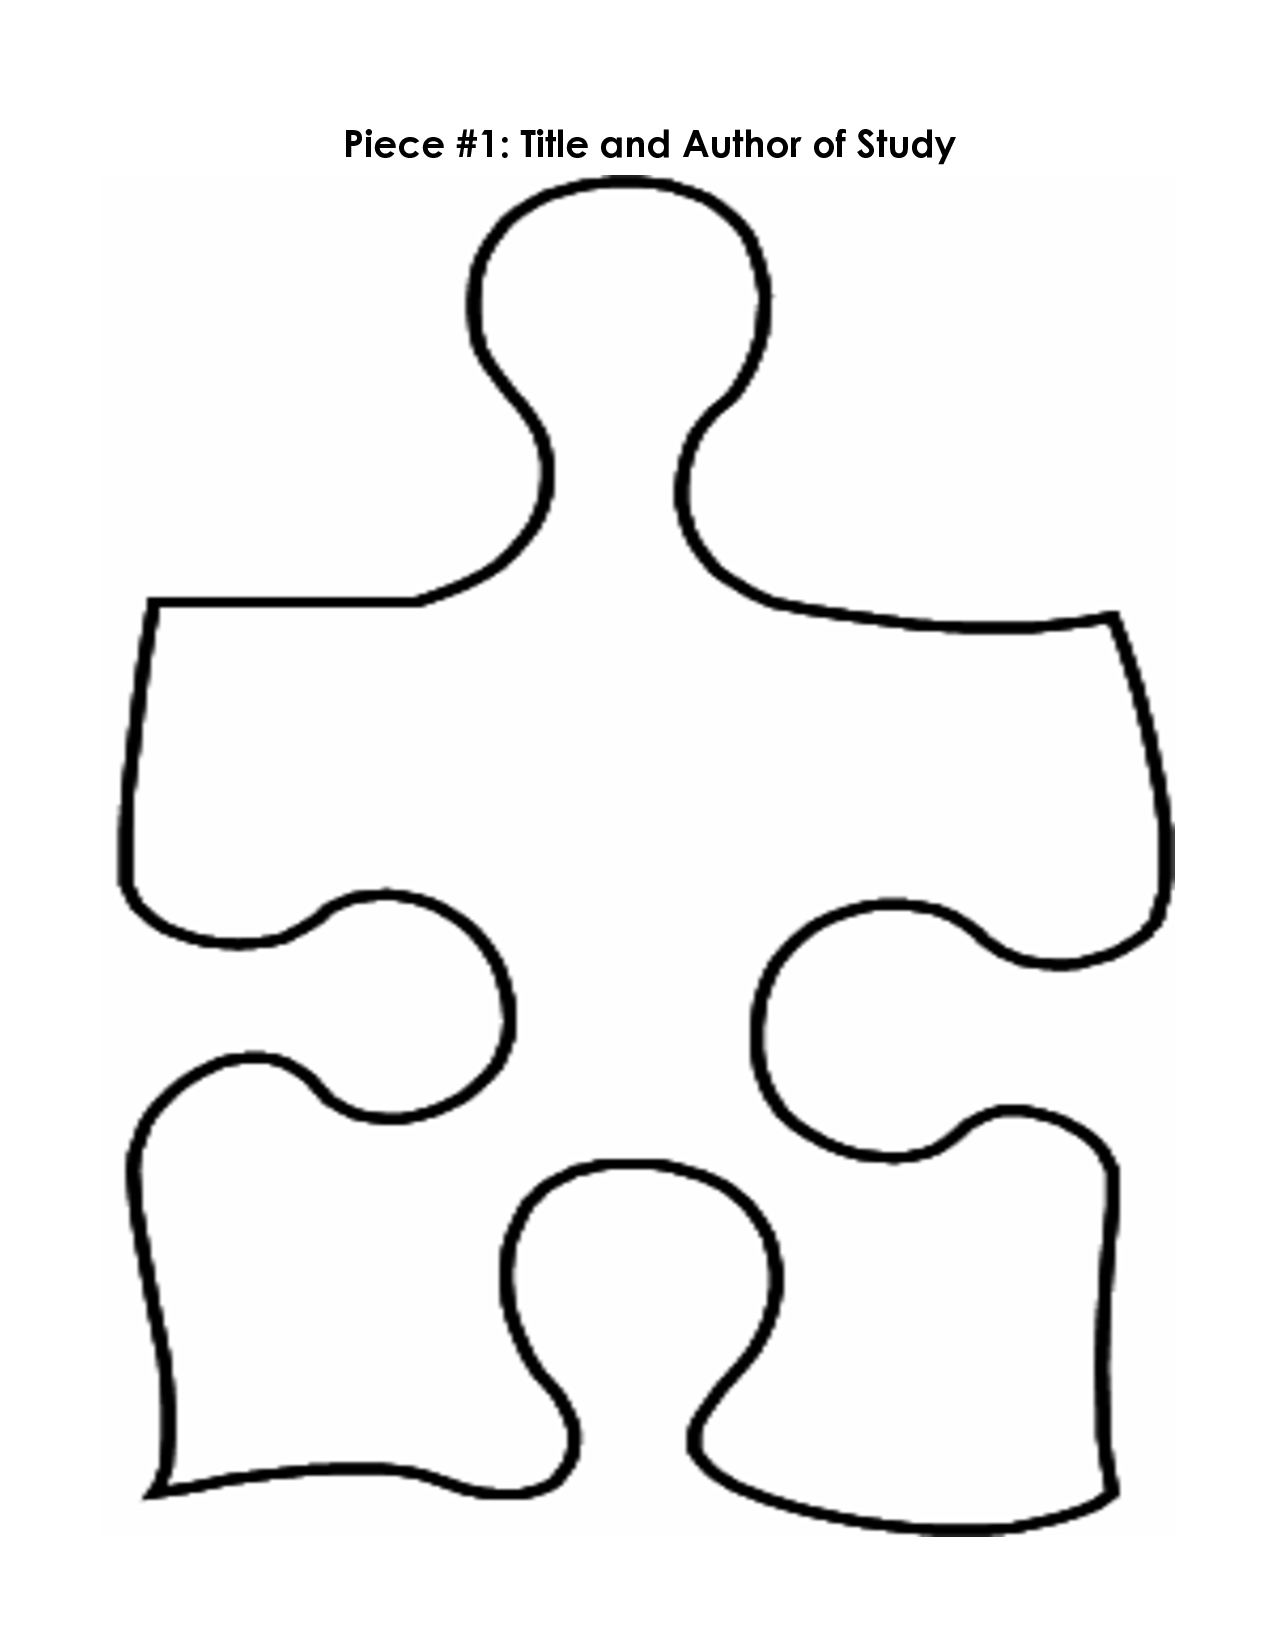 Large Puzzle Piece Template Clipartsco – Puzzle Piece Template